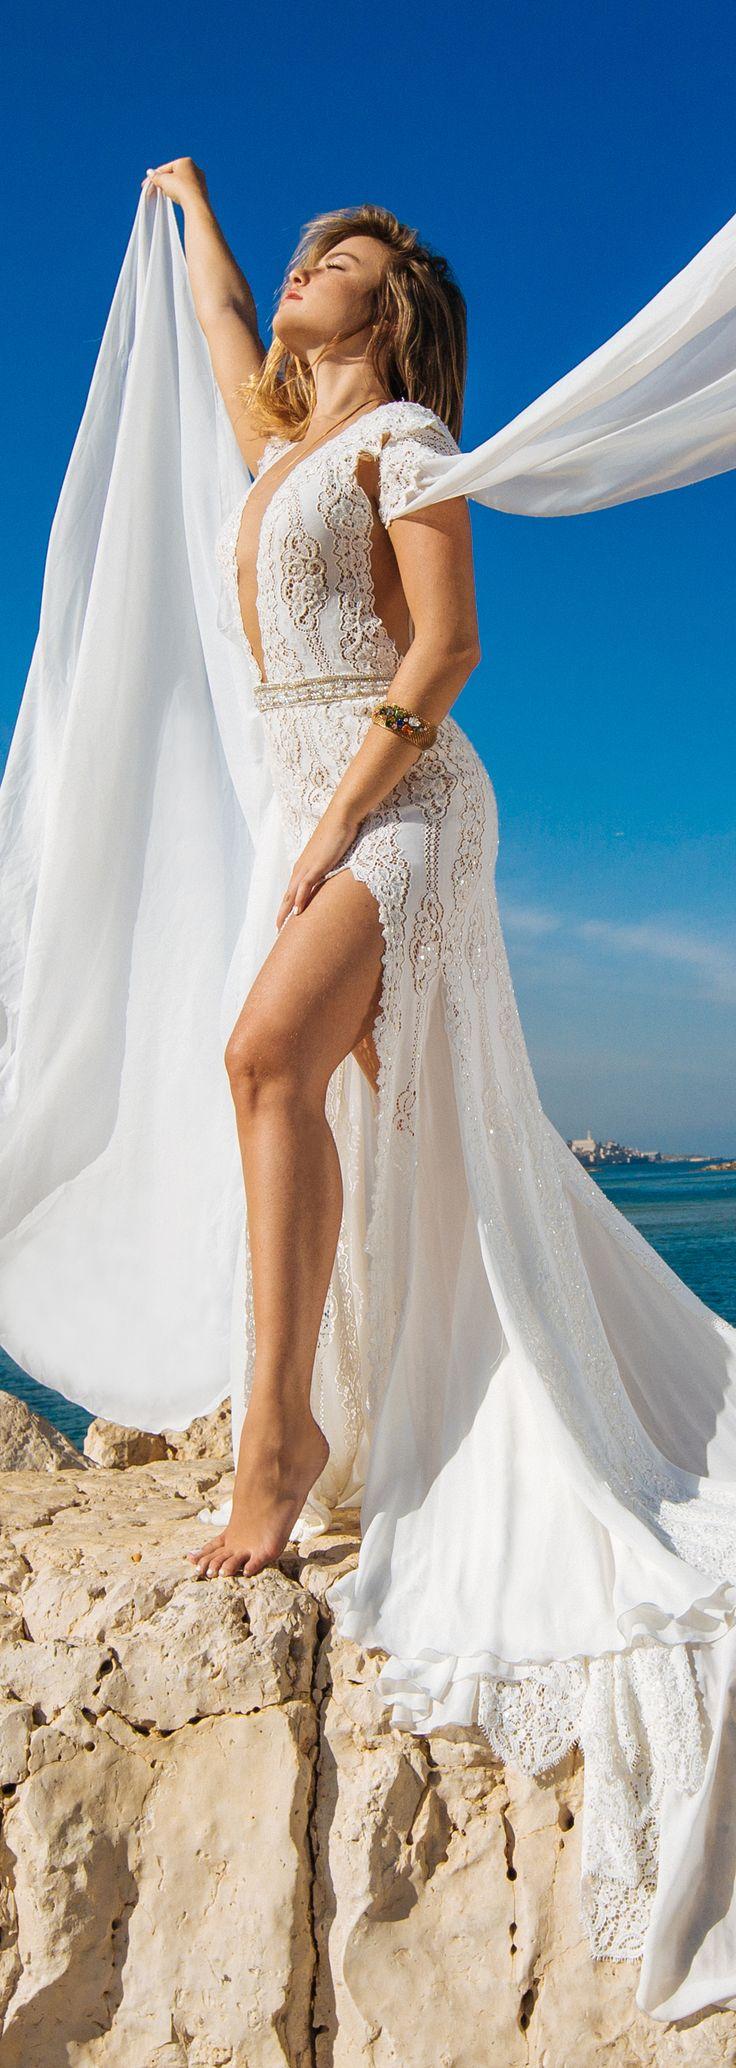 #wedding #beach #summer #bride #dress #couture #hautecouture